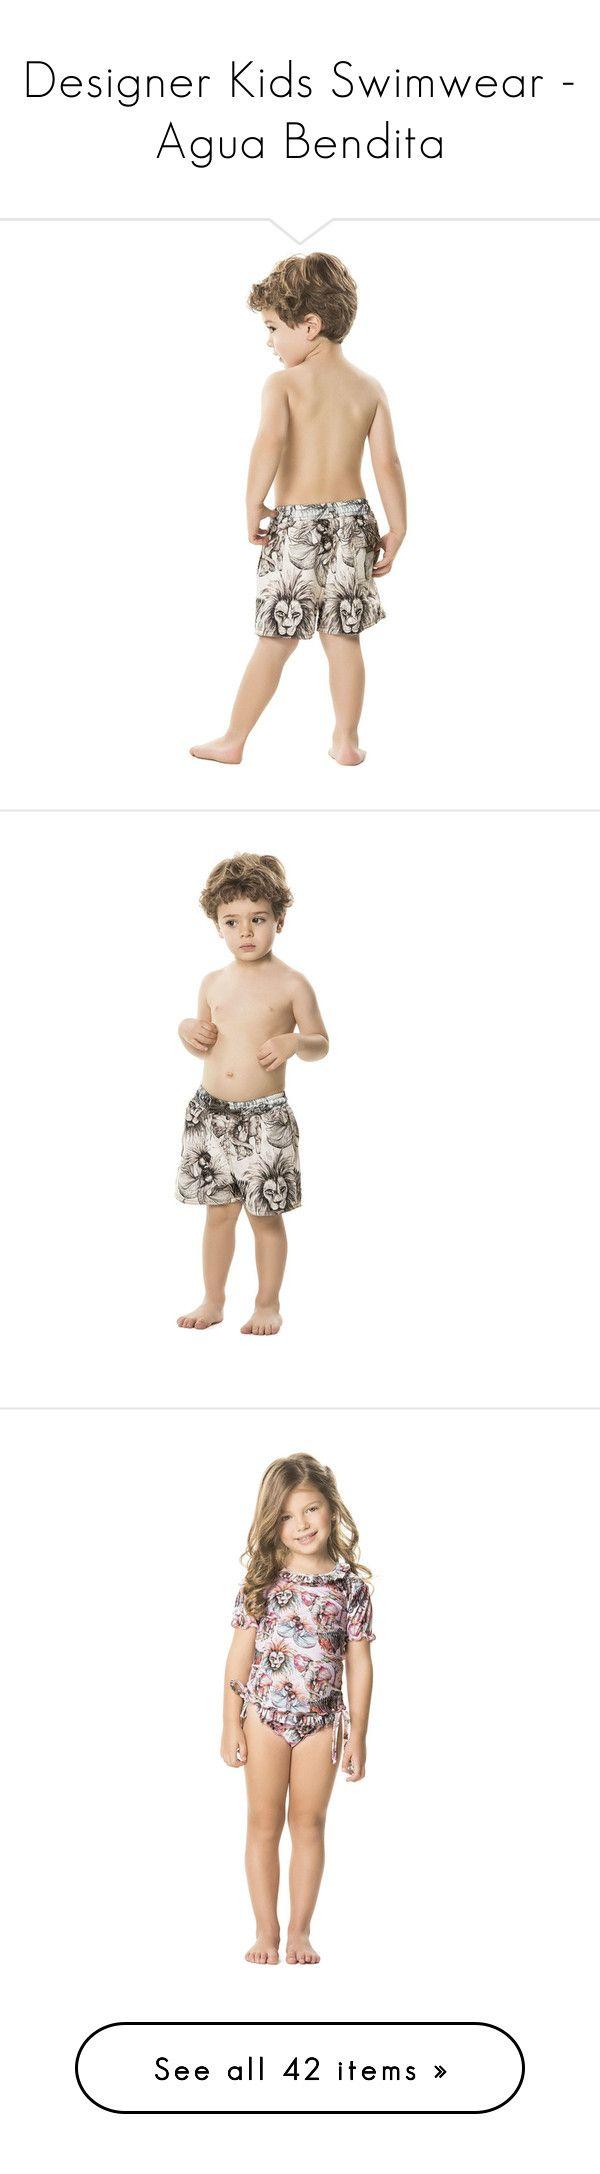 """Designer Kids Swimwear - Agua Bendita"" by bikiniluxe ❤ liked on Polyvore featuring swimwear, swim trunks, agua bendita, agua bendita swimwear, kids swimwear and kids"